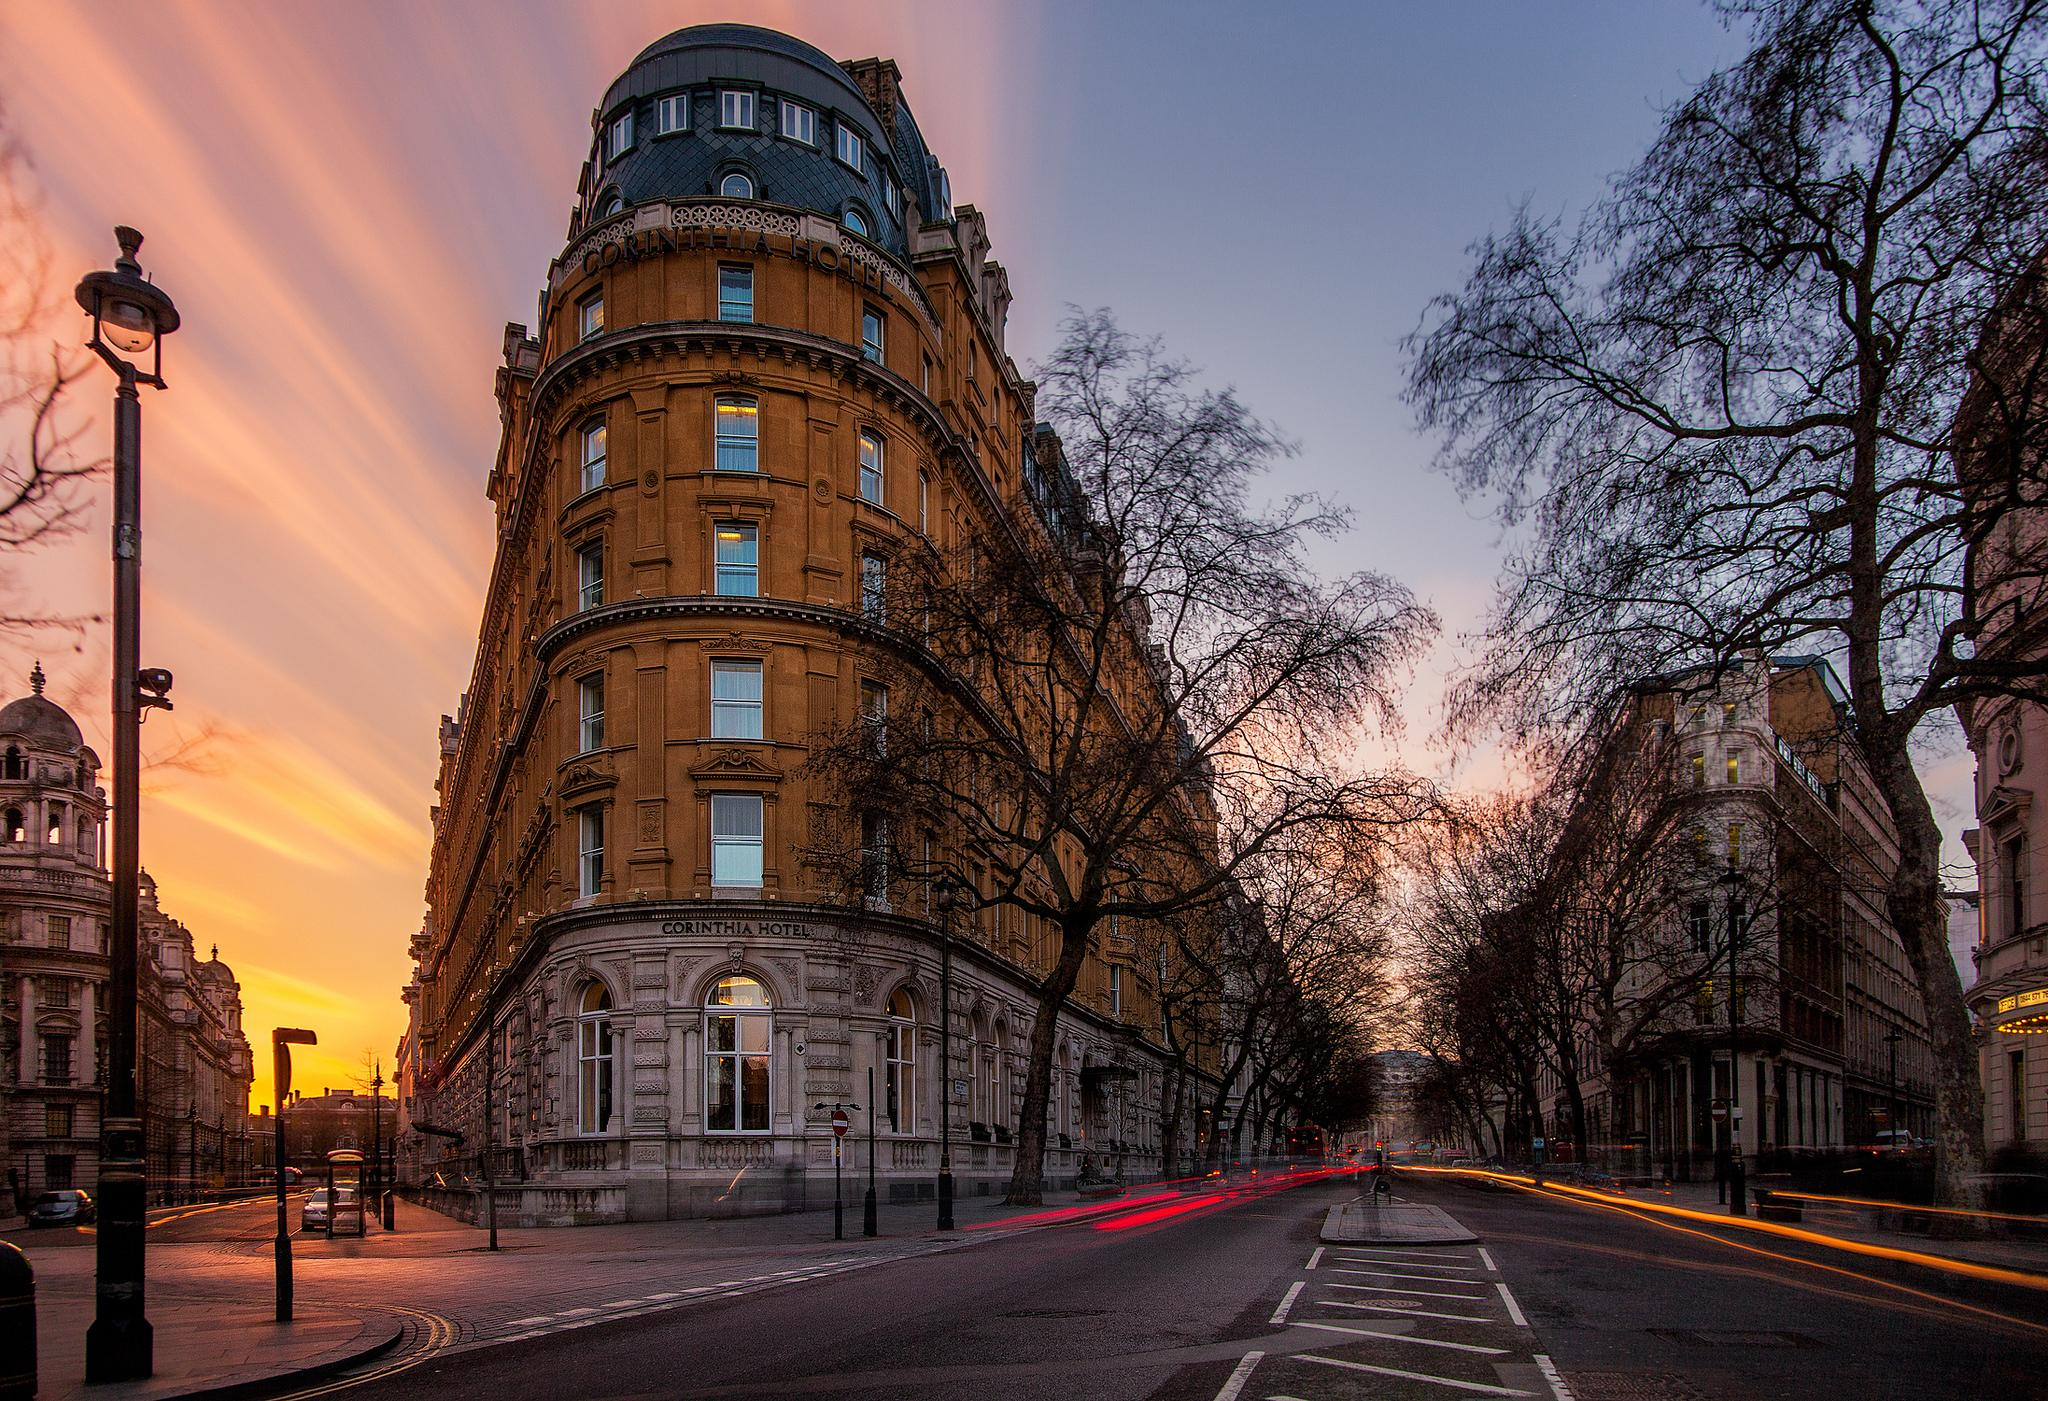 обои Corinthia Hotel, London, Лондон, Великобритания картинки фото